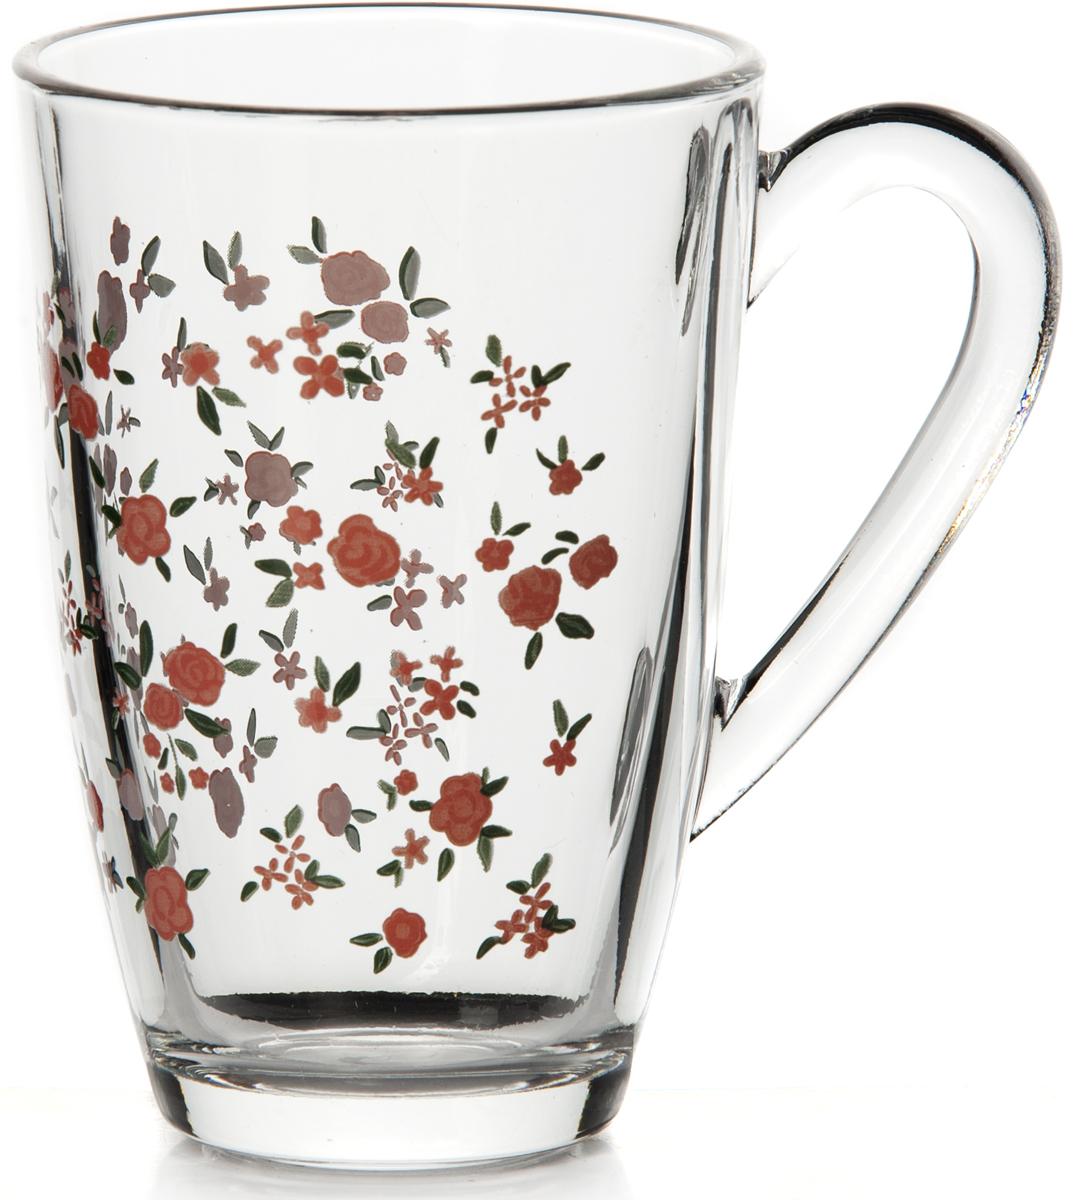 Кружка Pasabahce Прованс, 325 мл55393SLBSКружка прозрачная с декором - красные цветы, V-330 мл, h-120 мм, d-80 мм